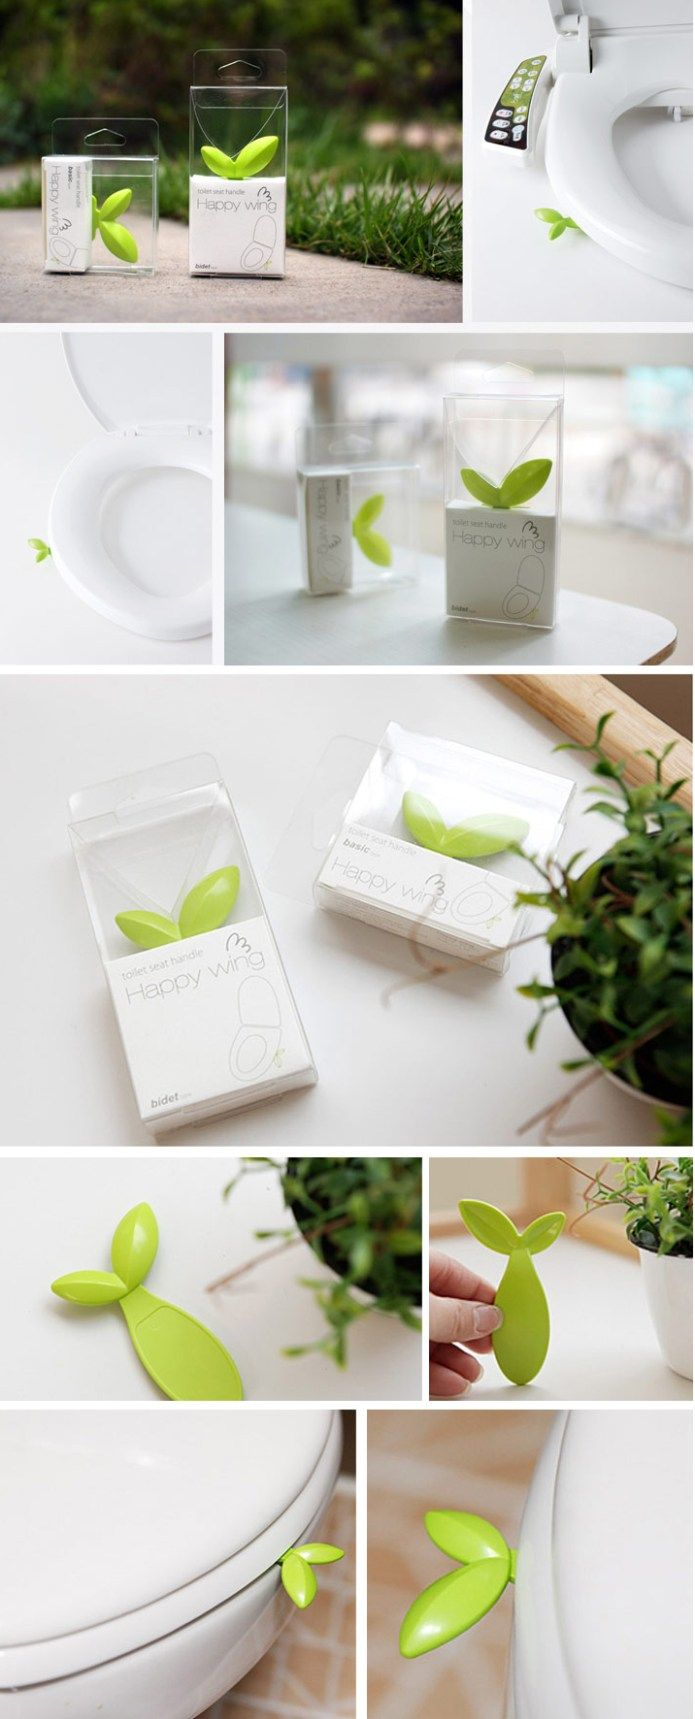 Leaf toilet seat handle bathroom pinterest utensilios ba os y tecnologia - Utensilios bano ...